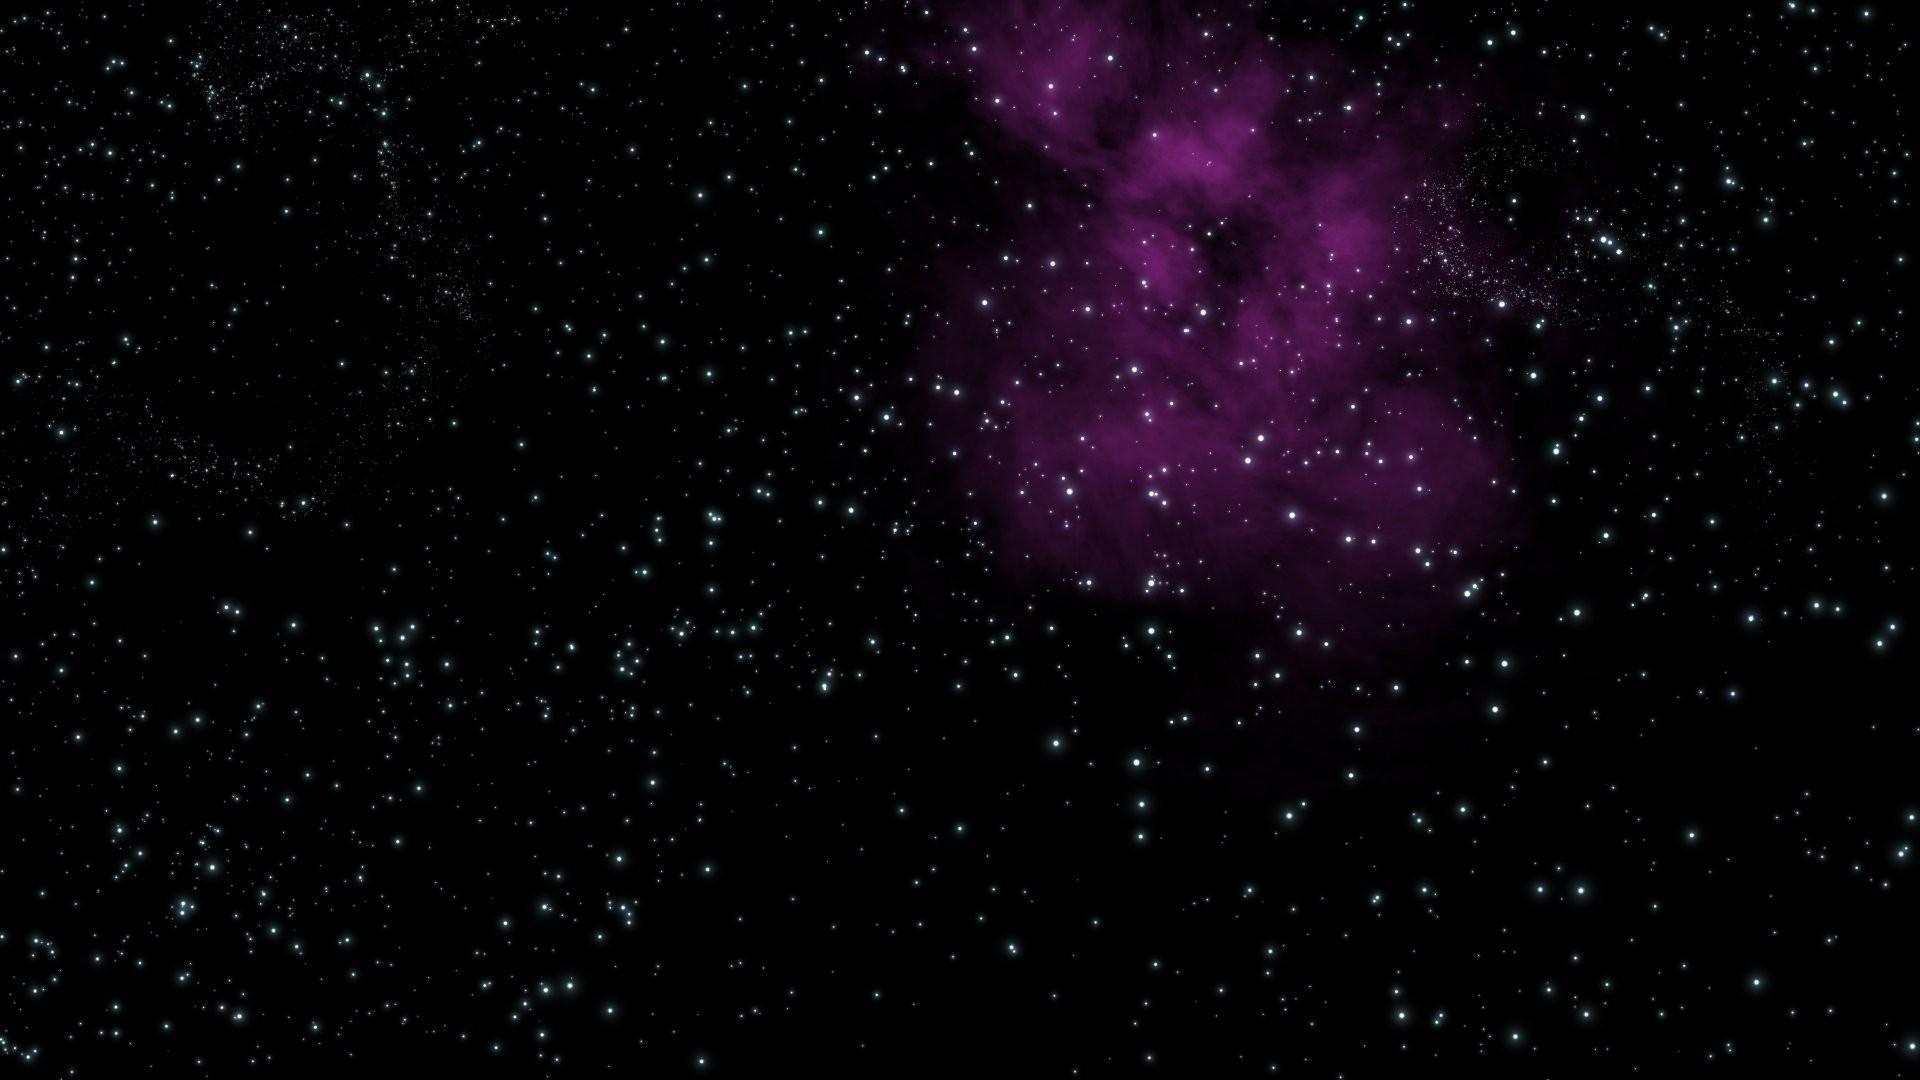 Background Tumblr Stars Hd